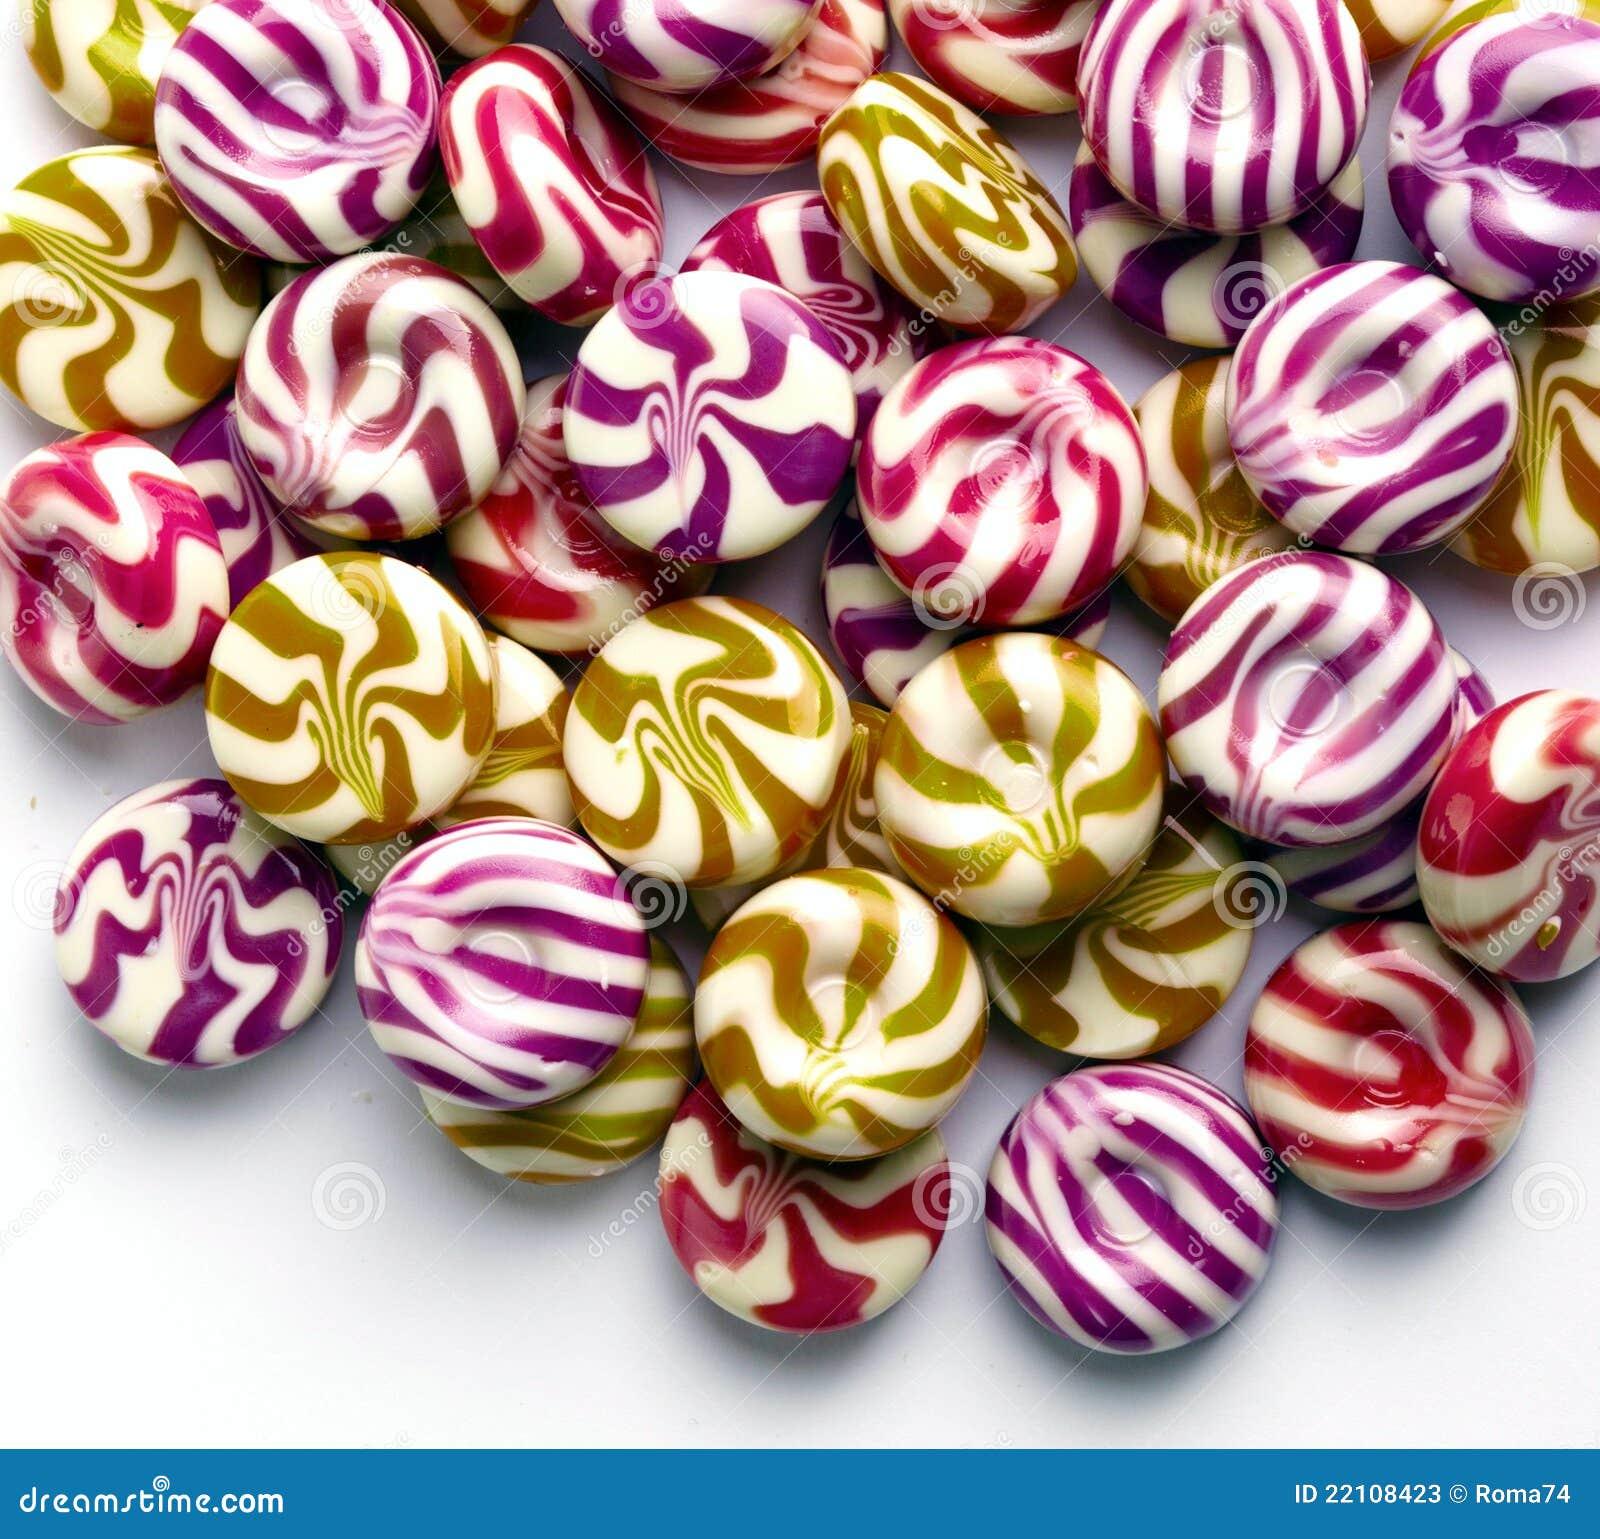 Caramel Sweet Color Background Stock Photos - Image: 22108423